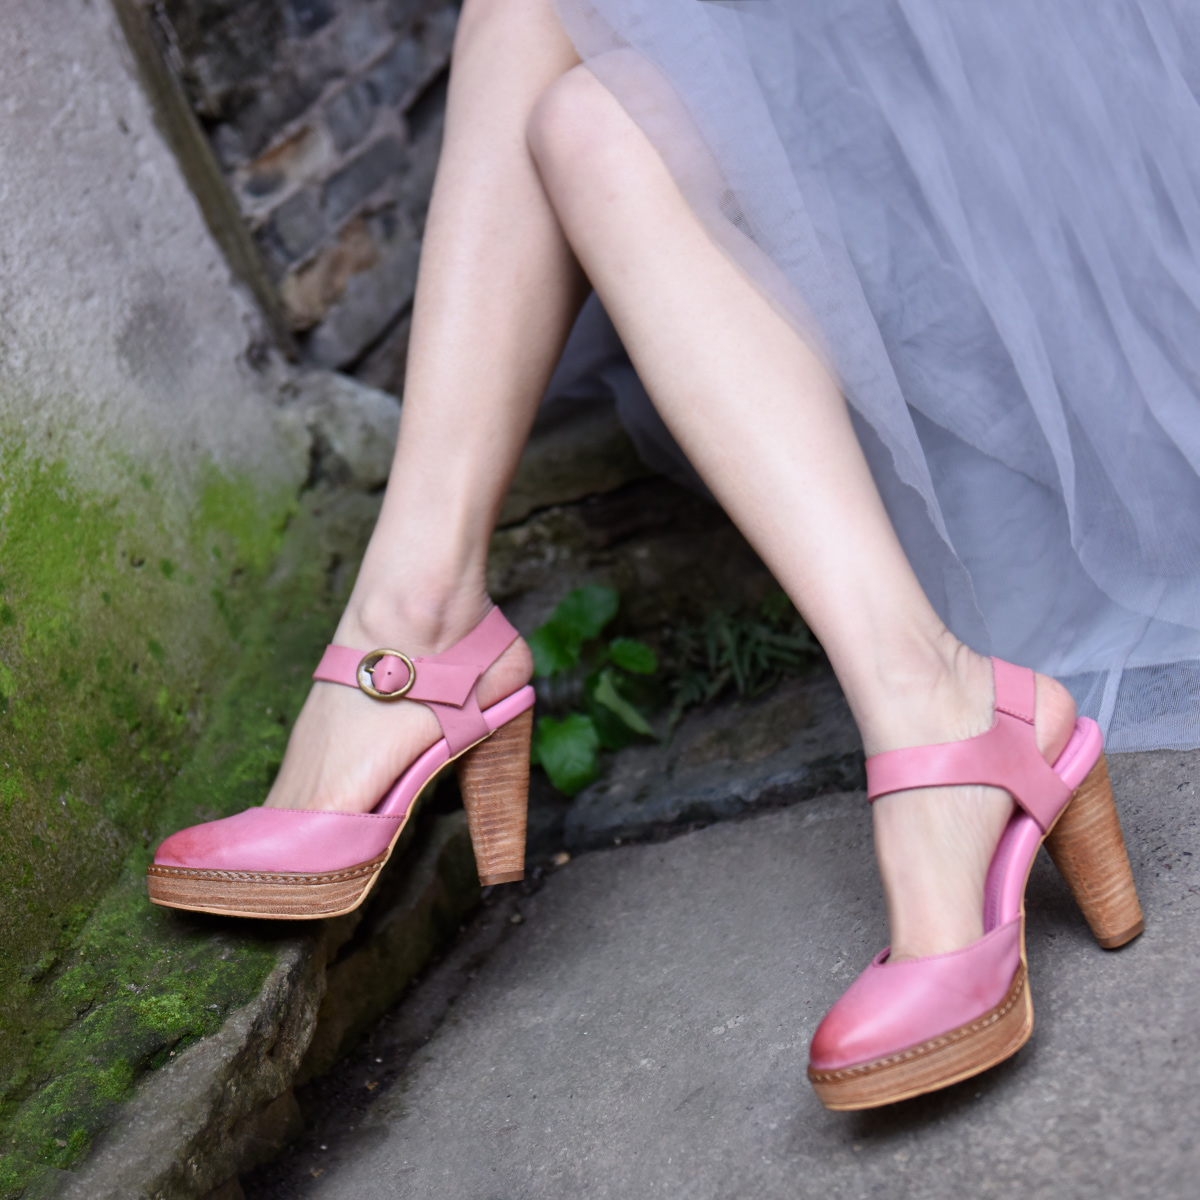 Artmu Original Super High Heels Pumps Women Sandals Closed Toe 9 5cm Heels Handmade Genuine Leather